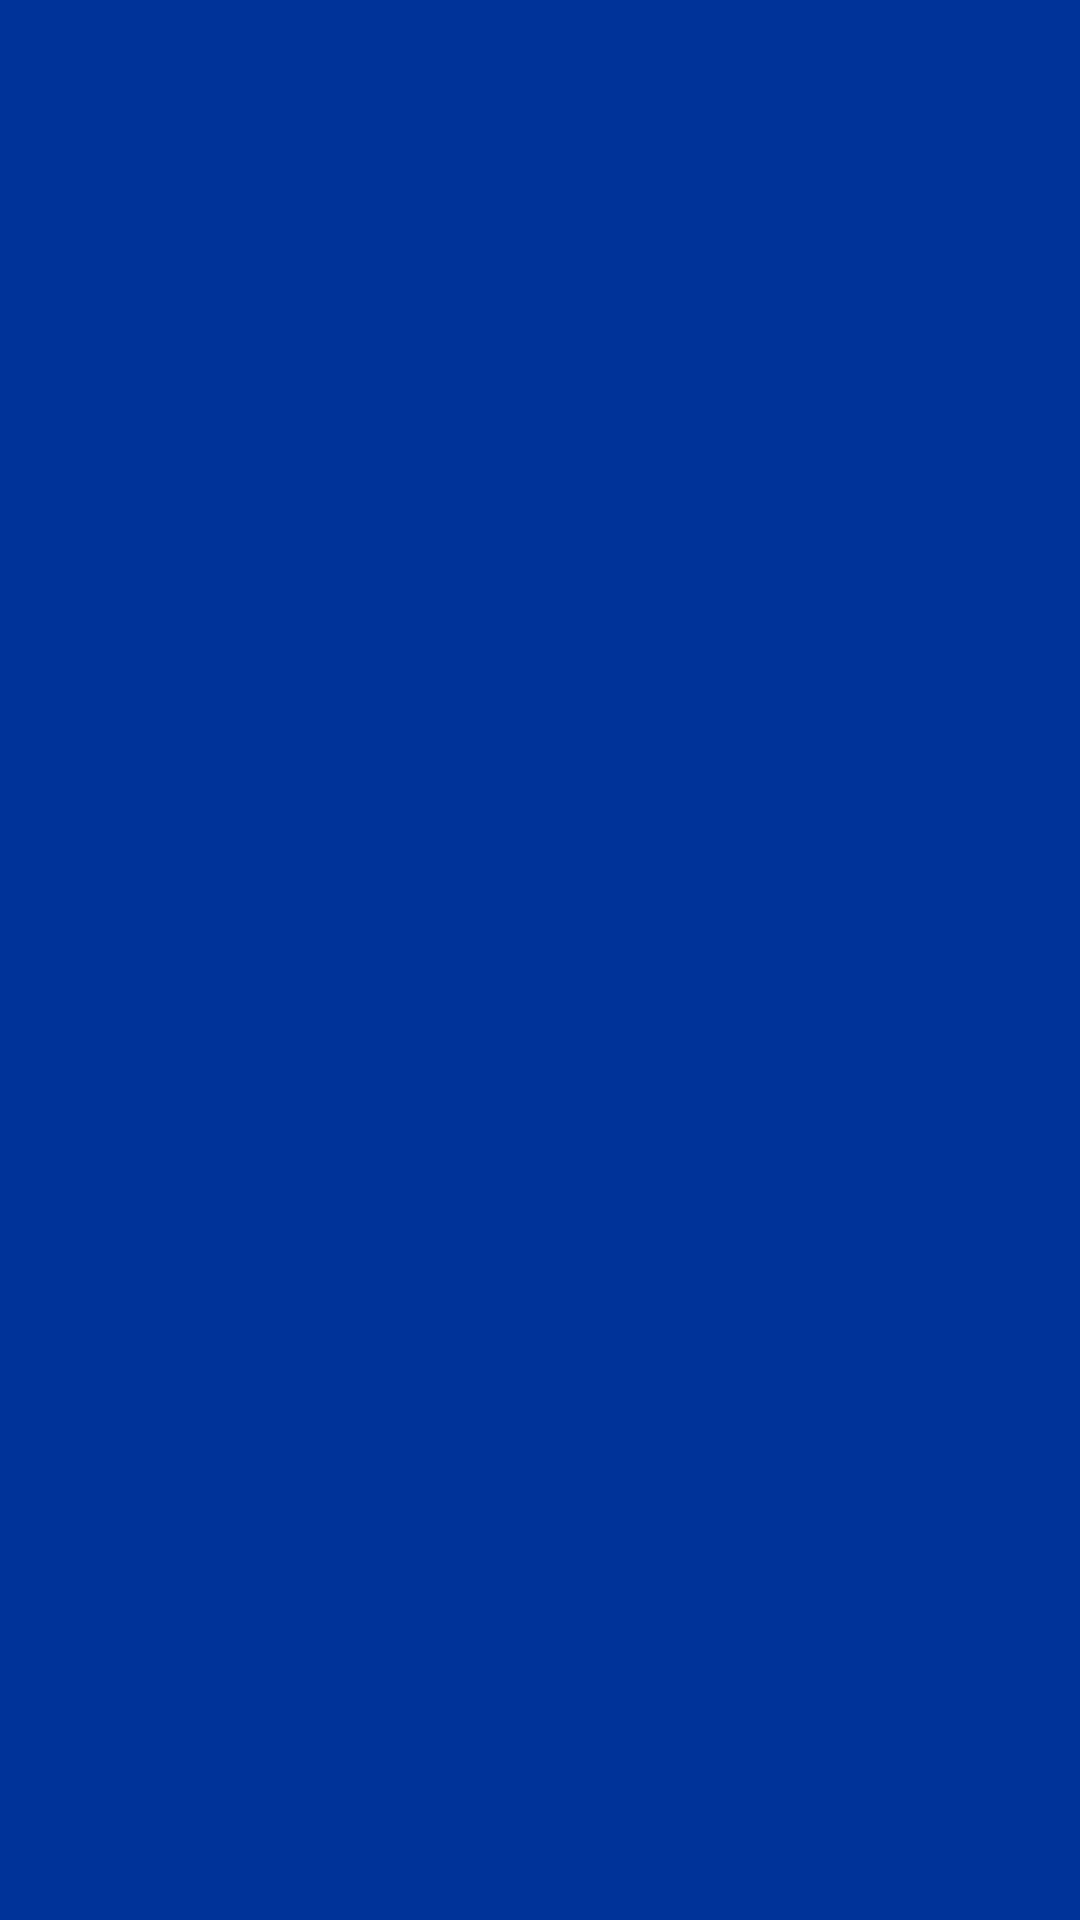 1080x1920 Dark Powder Blue Solid Color Background